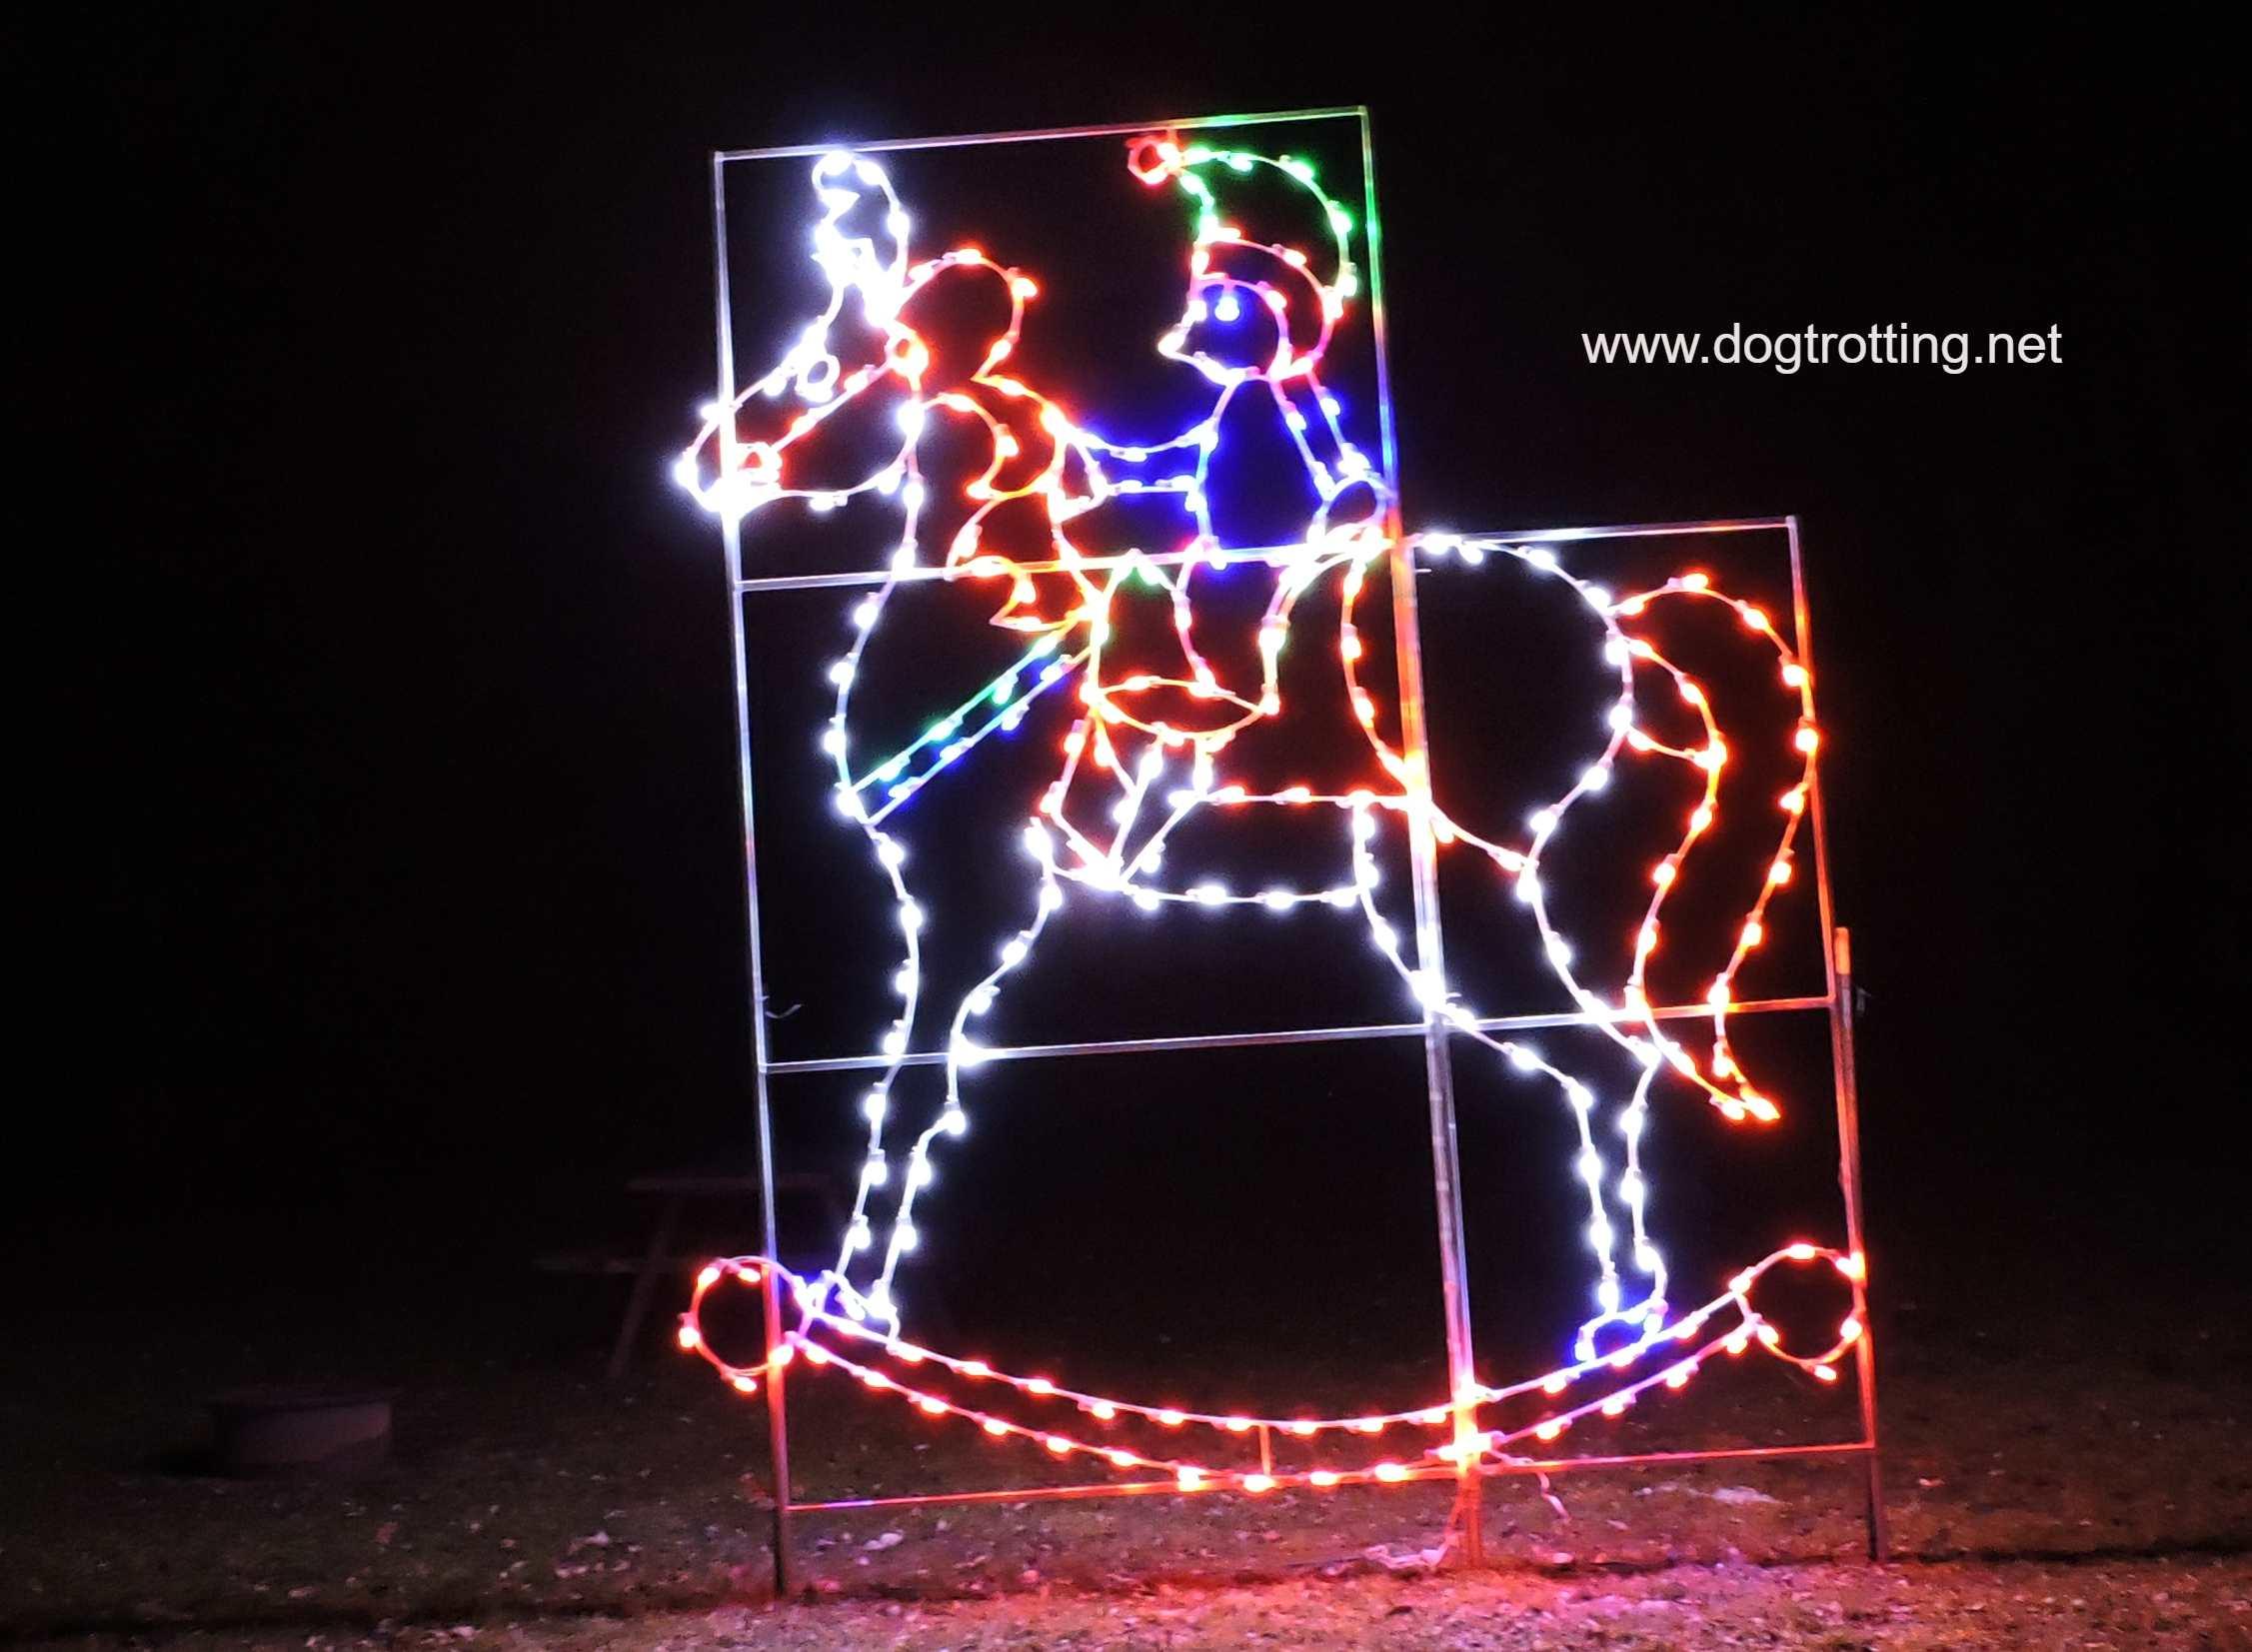 Christmas light show in Kitchener, Ontario